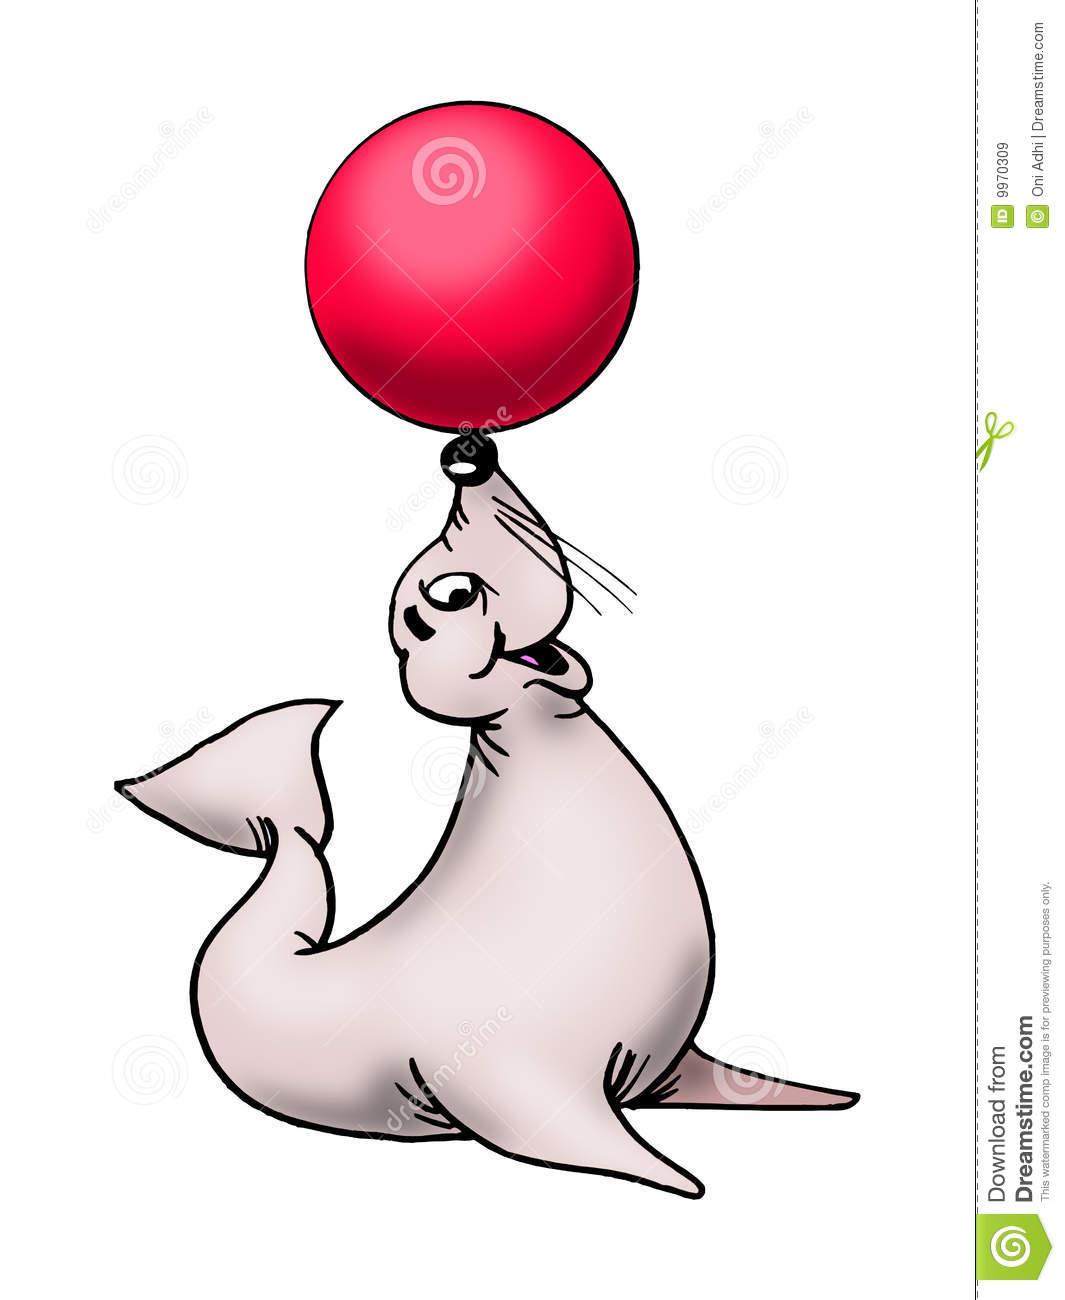 Seal clipart circus show #8